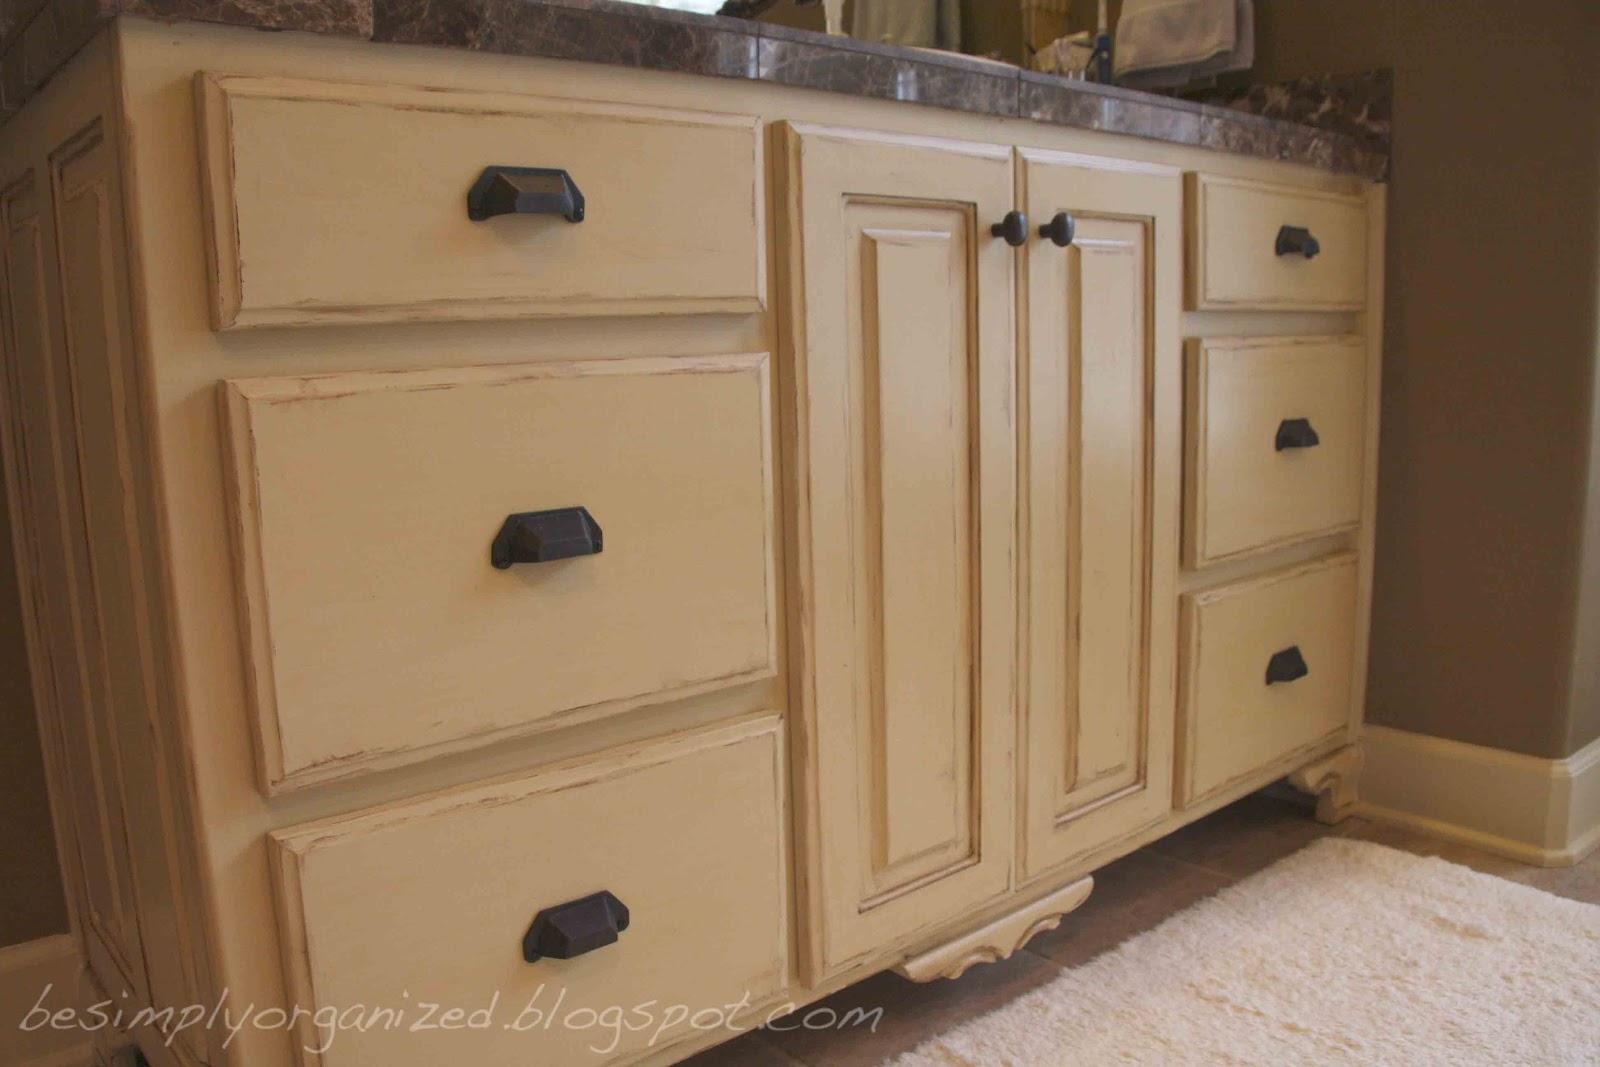 bathroom drawers - simply organized